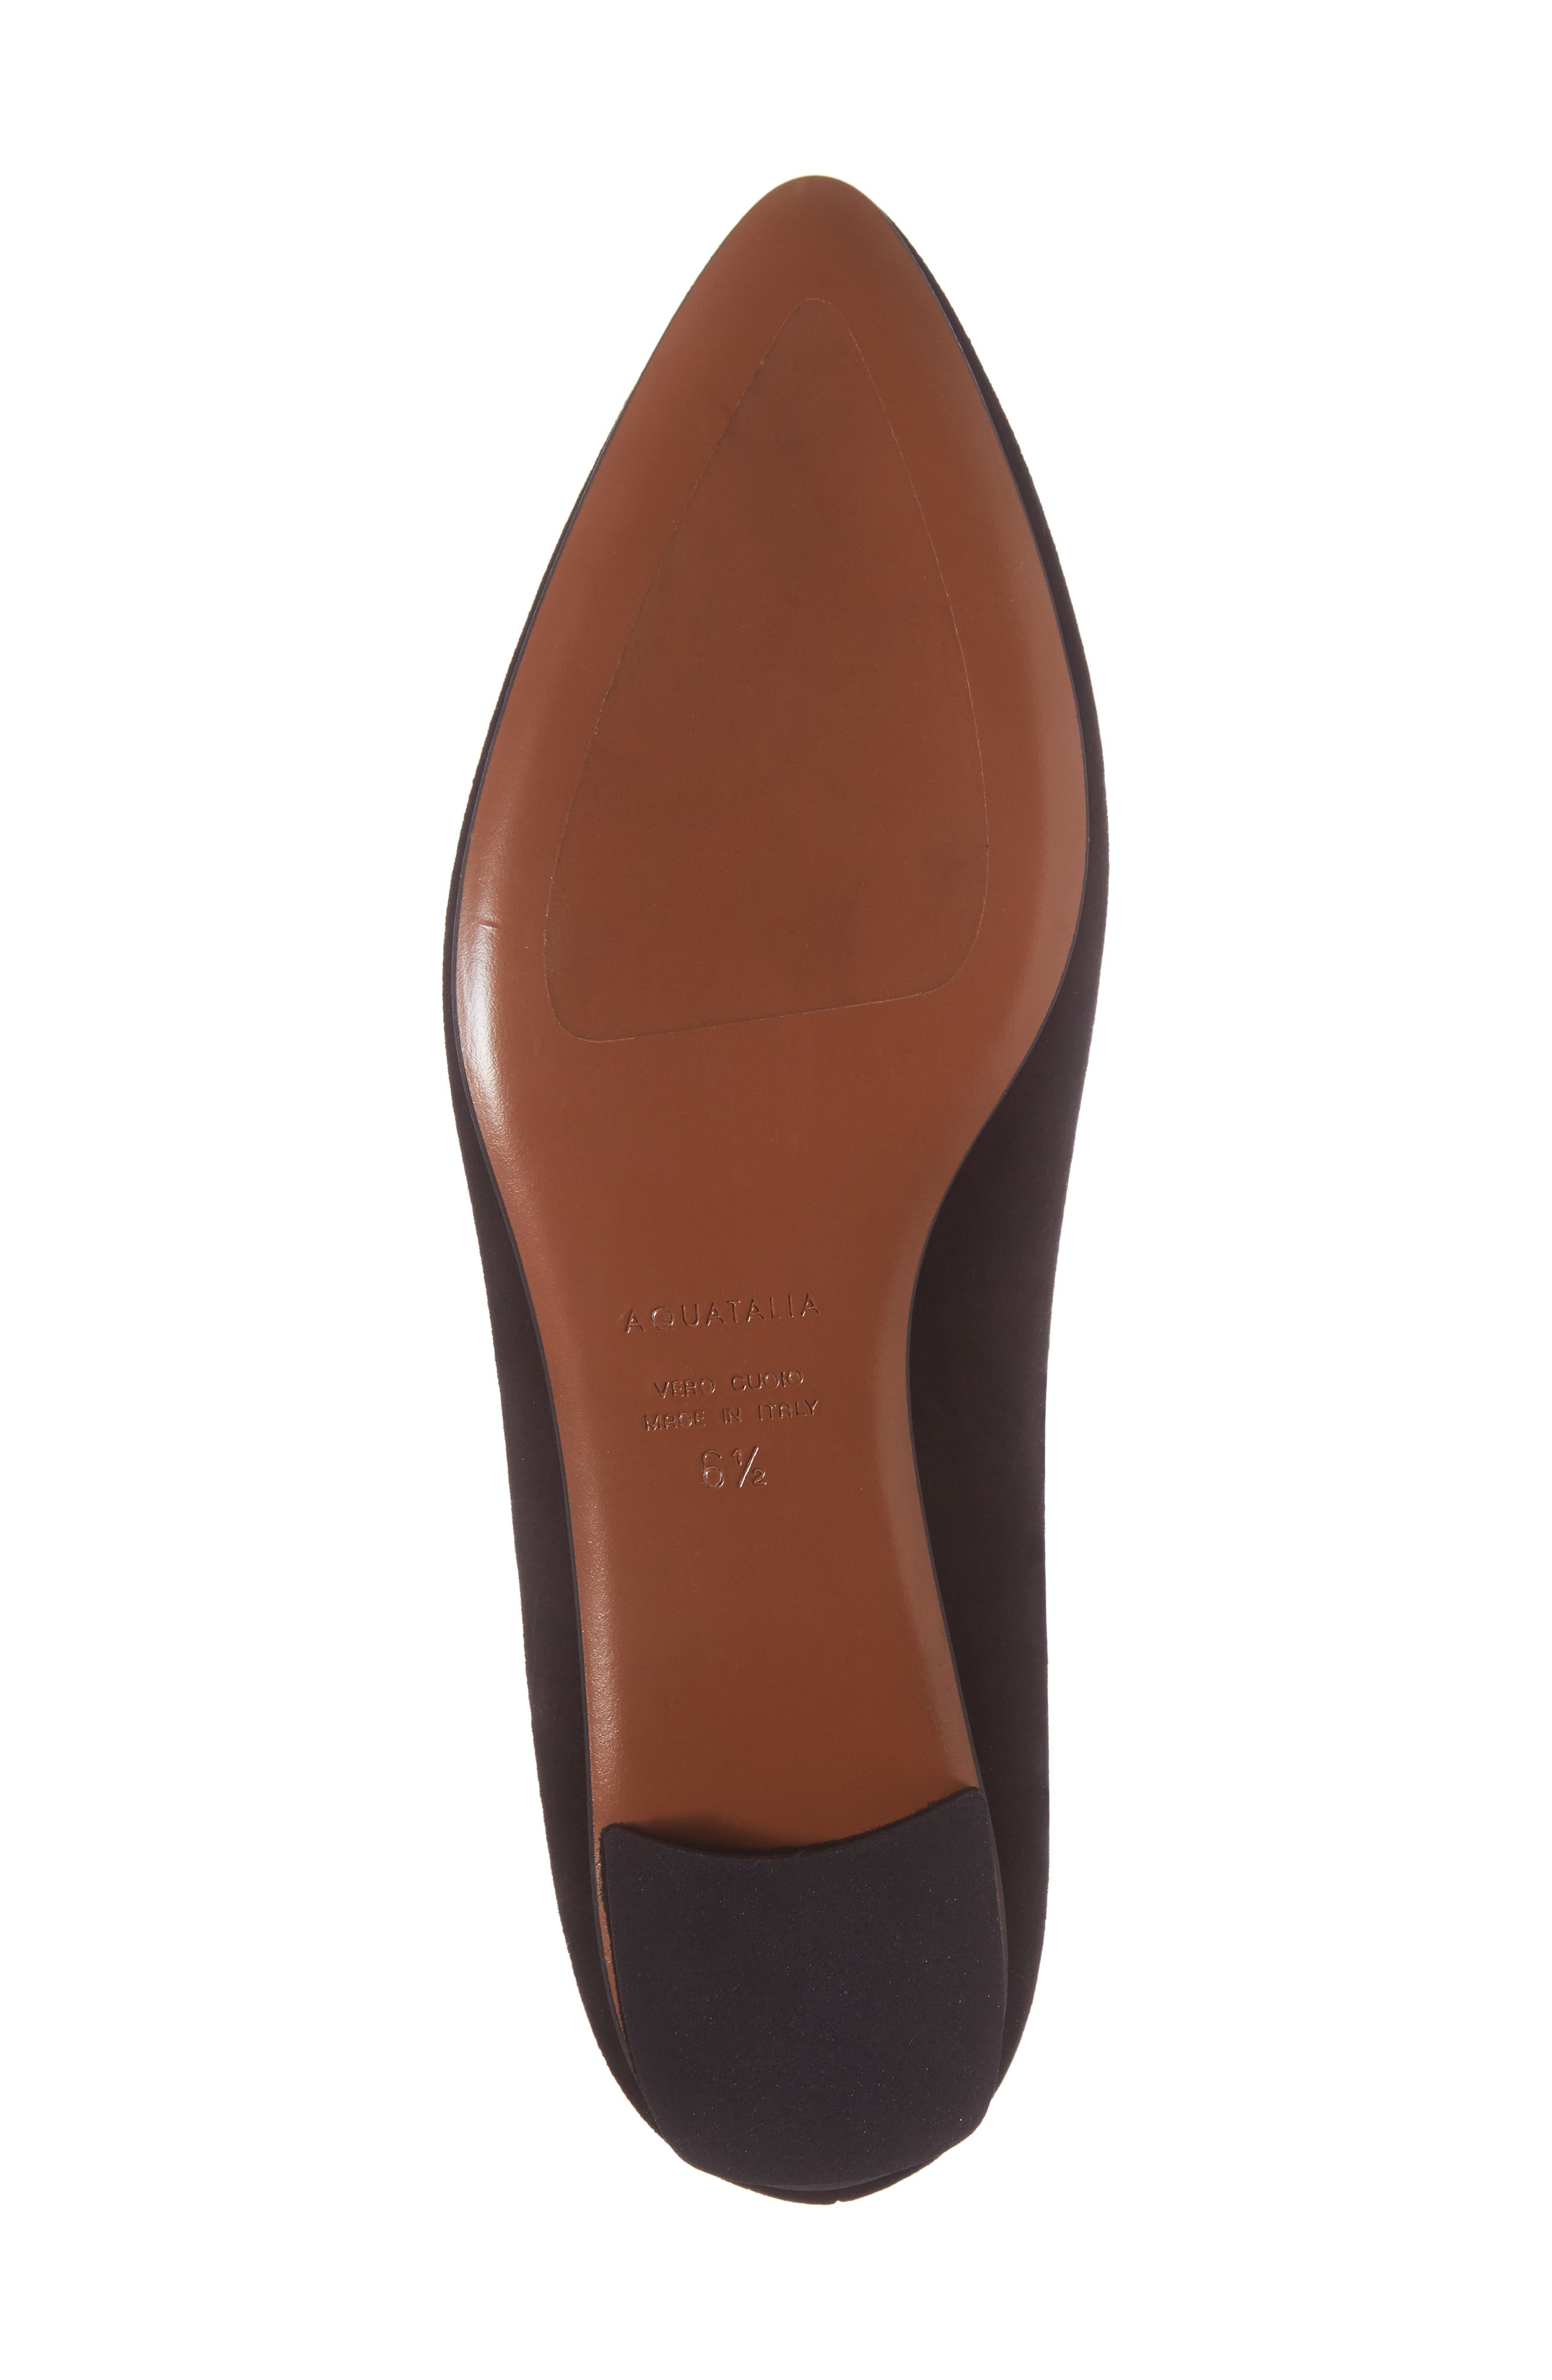 Perla Weatherproof Ballerina Shoe,                             Alternate thumbnail 6, color,                             Black Suede